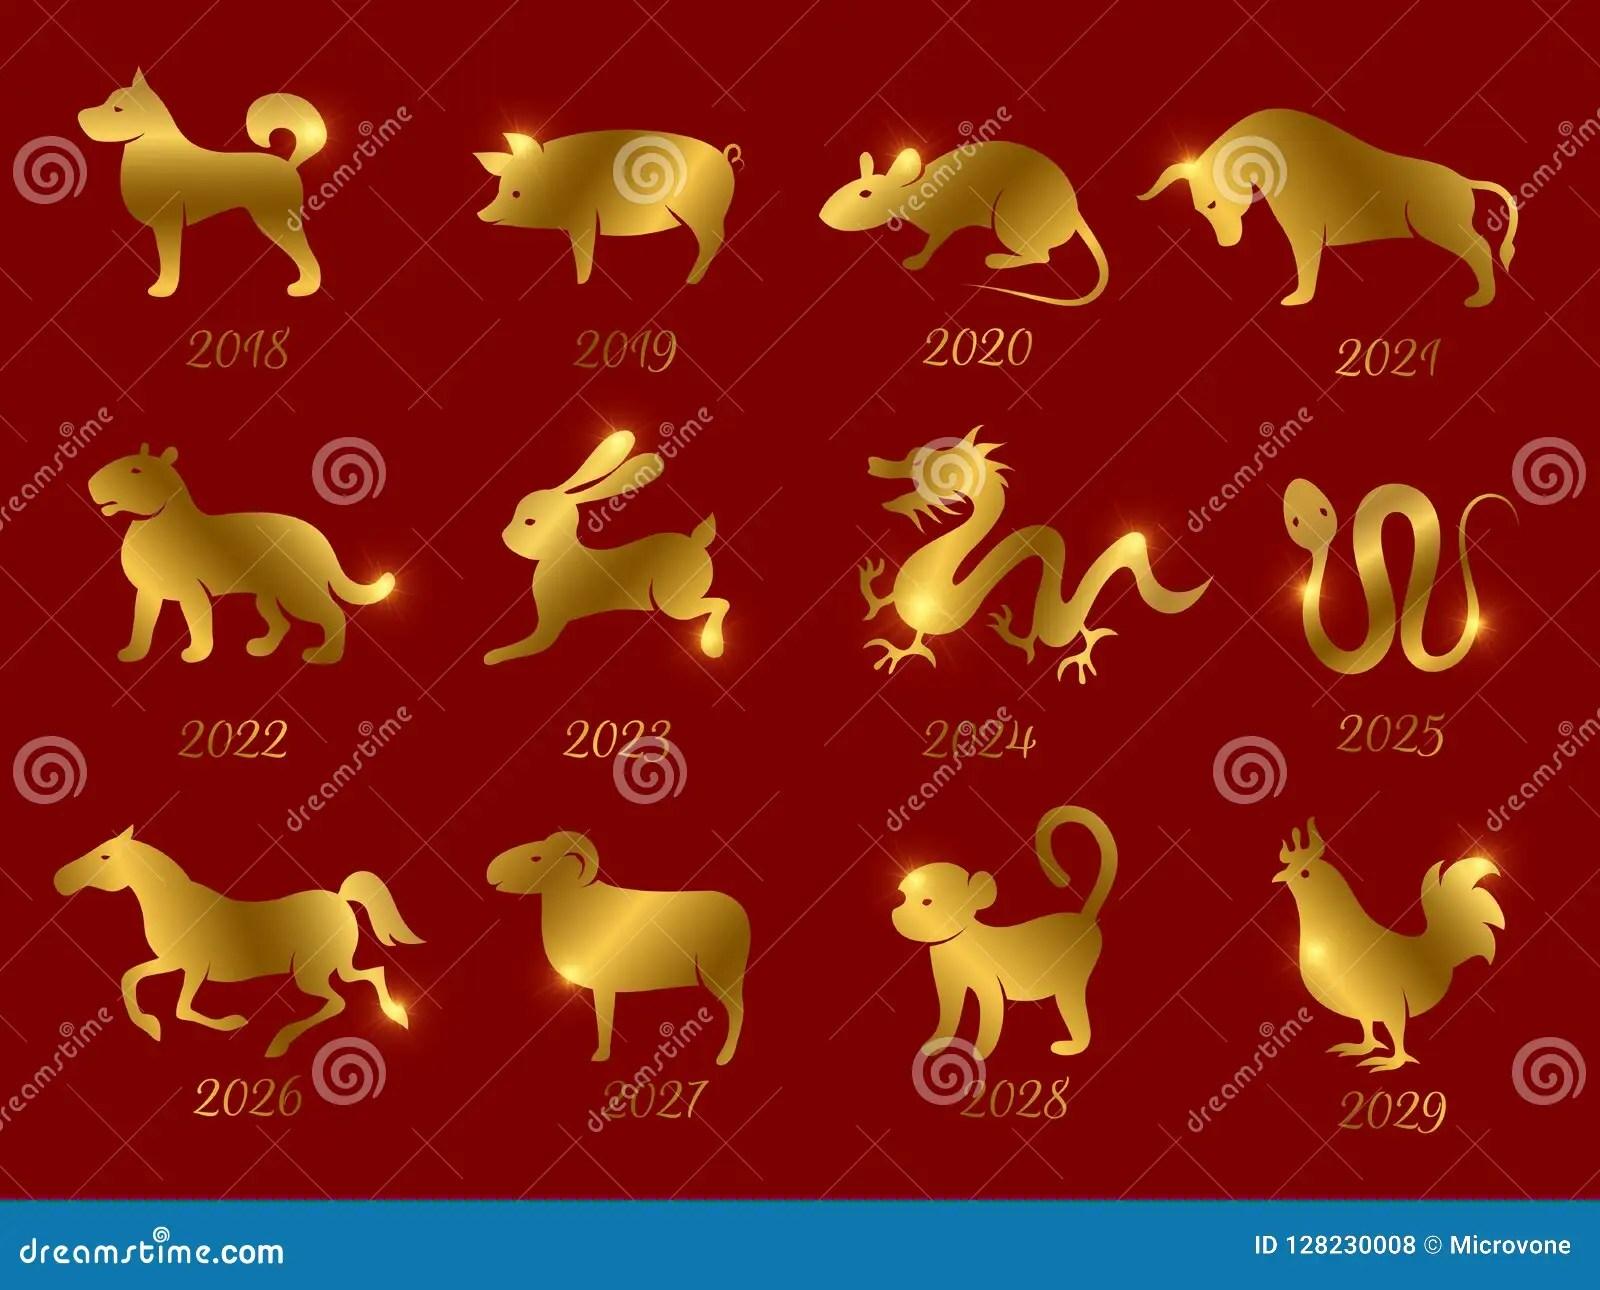 gold chinese horoscope zodiac